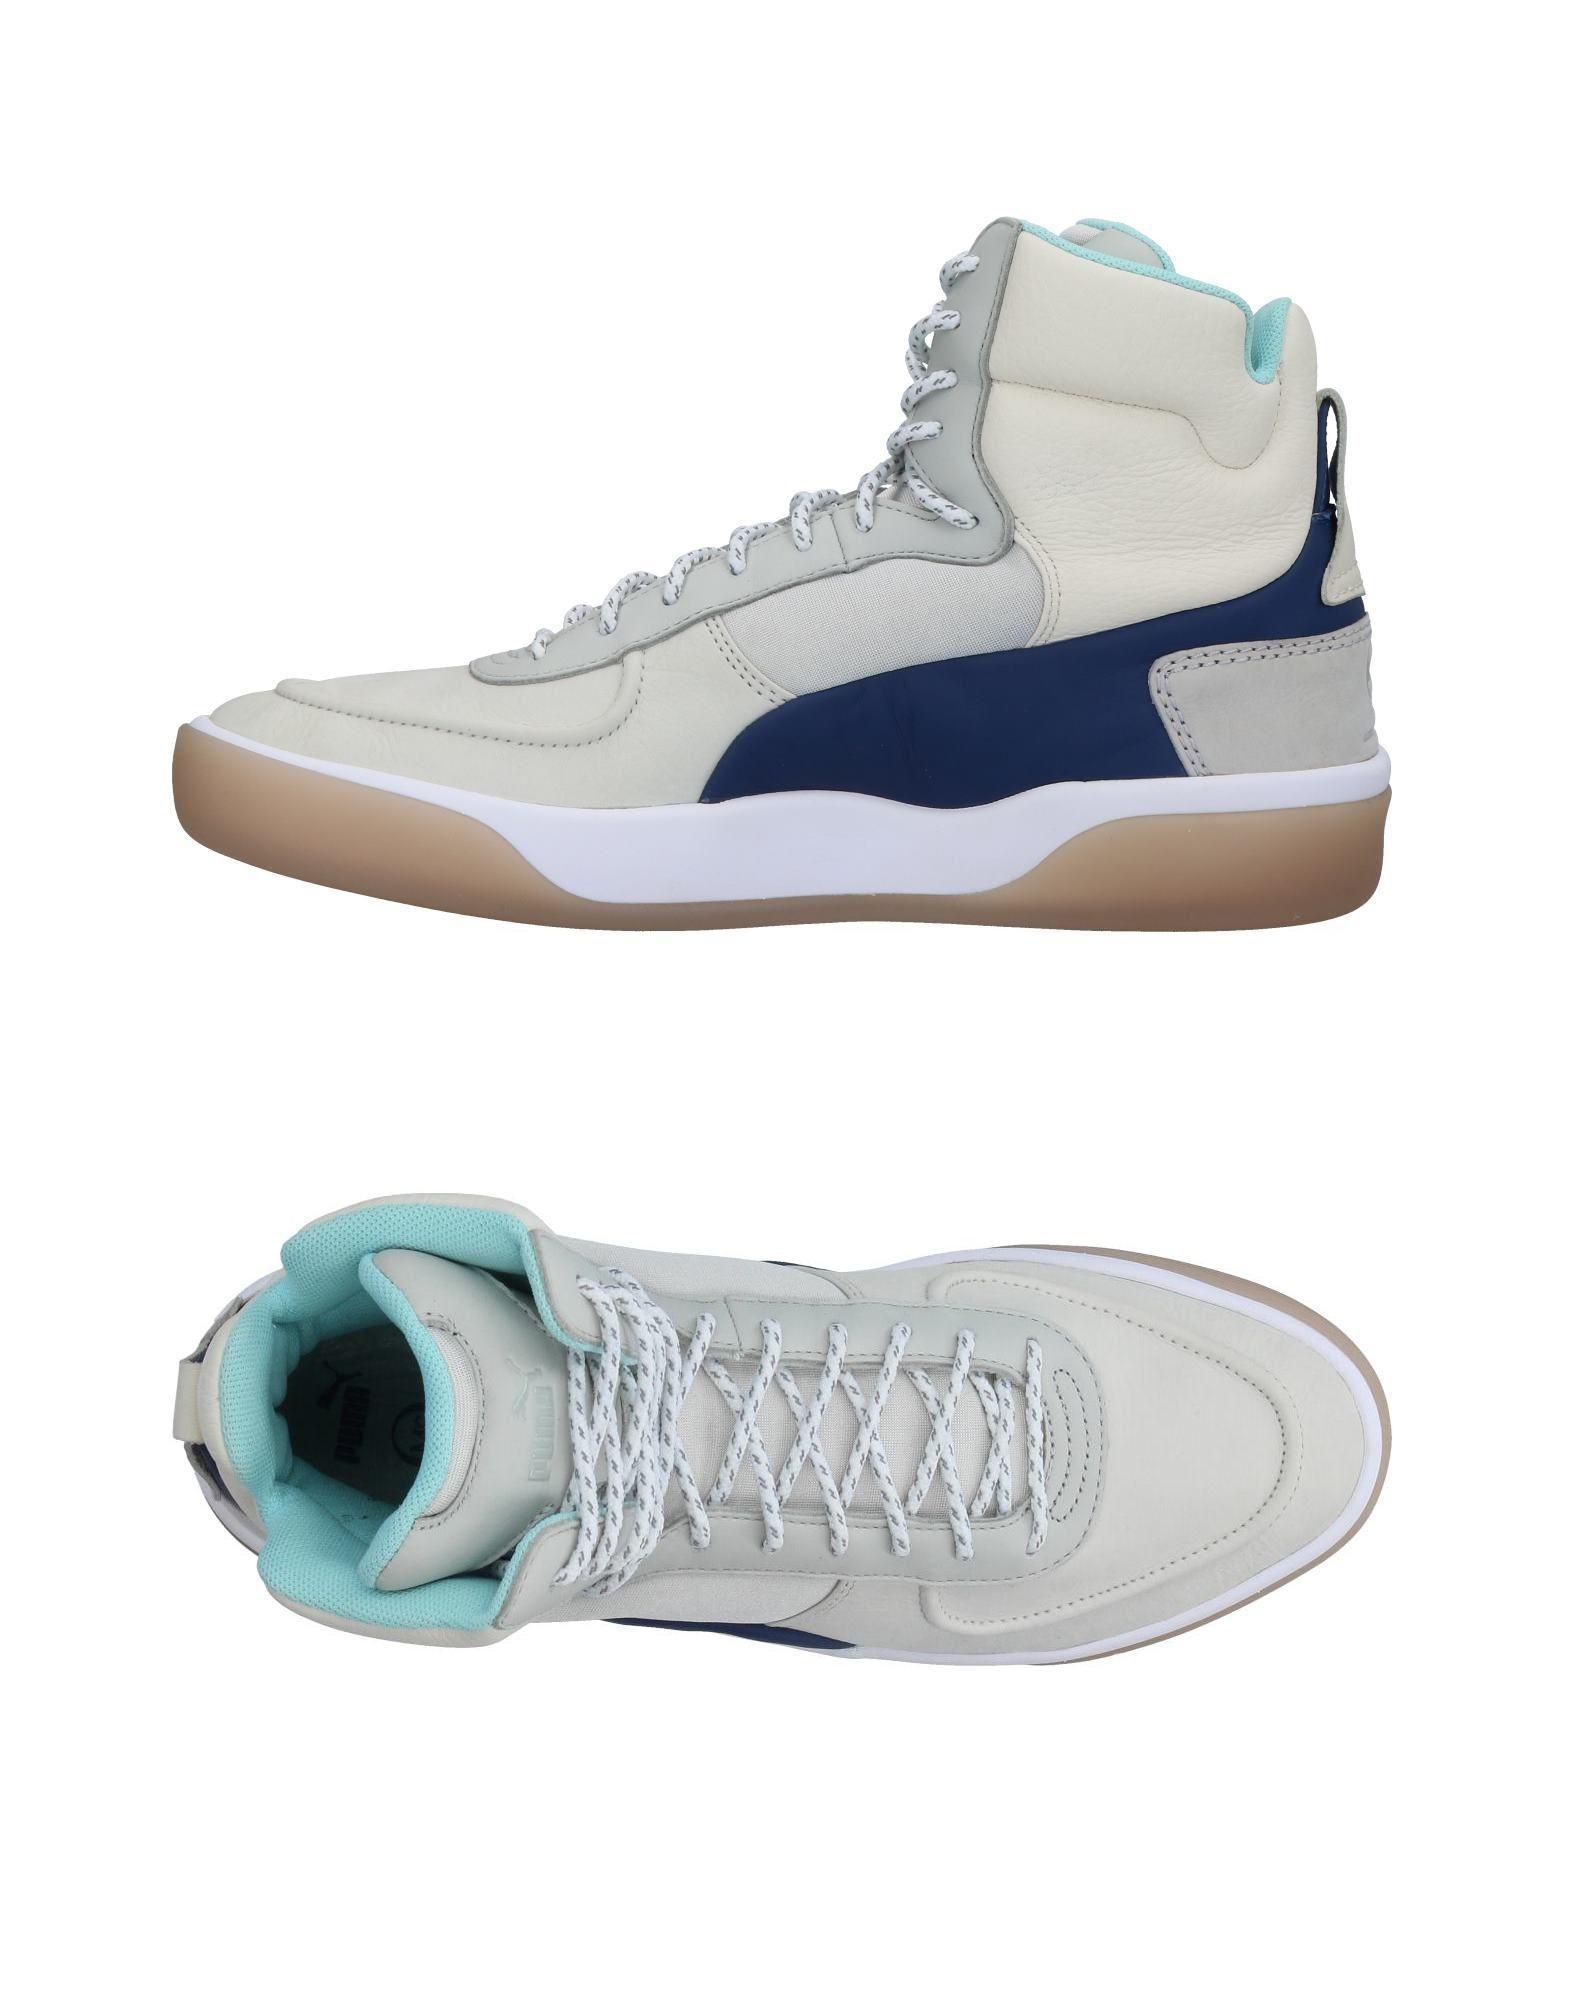 Lyst - Alexander Mcqueen X Puma High-tops   Sneakers in Gray b84b790bd